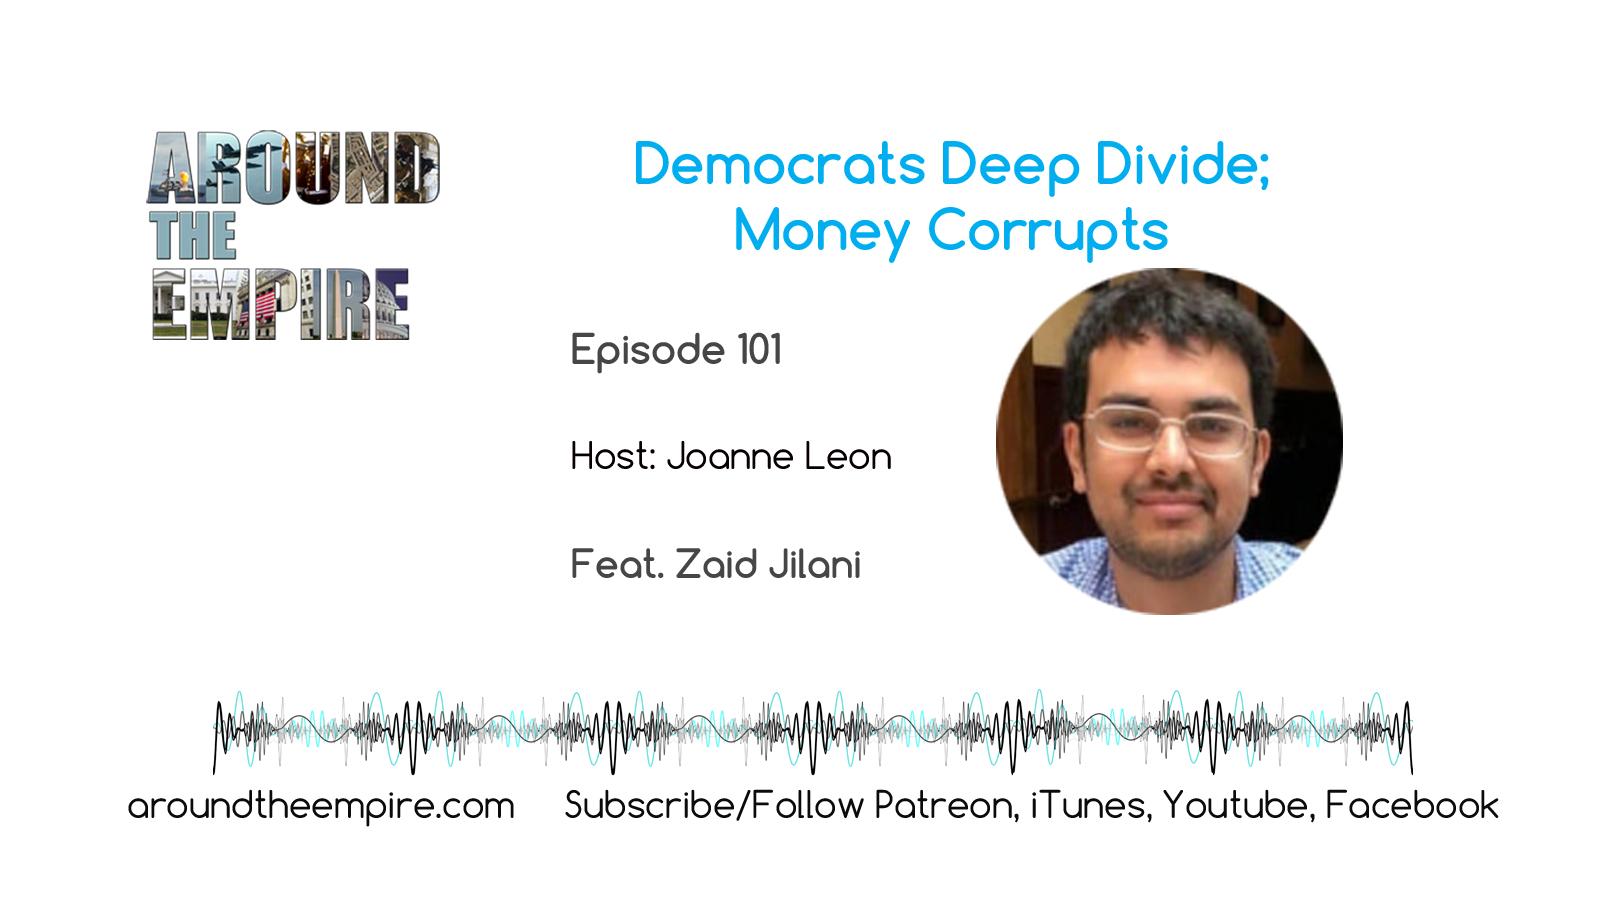 Ep101 Democrats Deep Divide feat Zaid Jilani